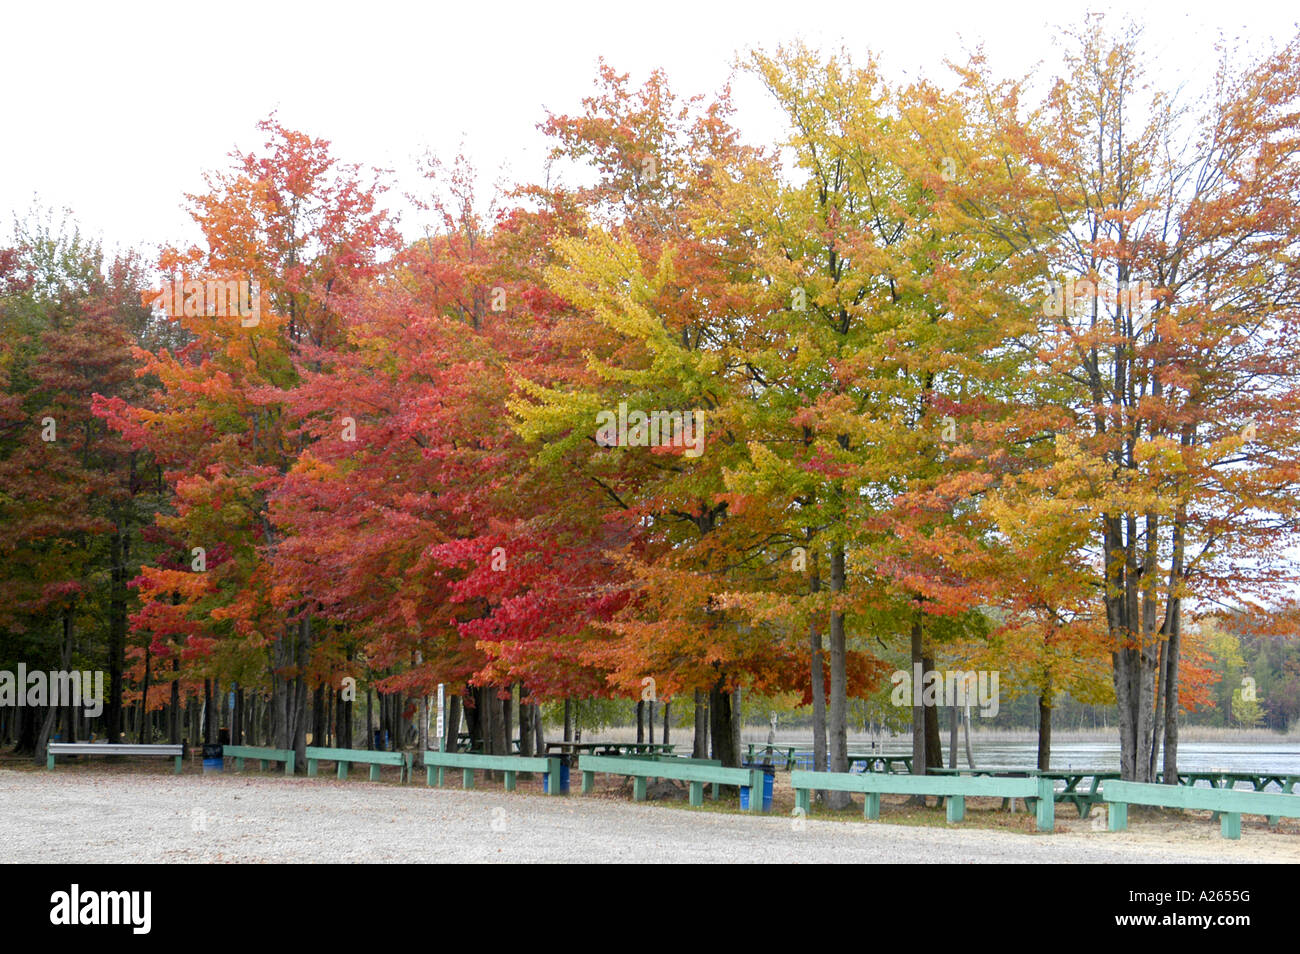 Fall colors in Southeast Michigan MI near Detroit - Stock Image